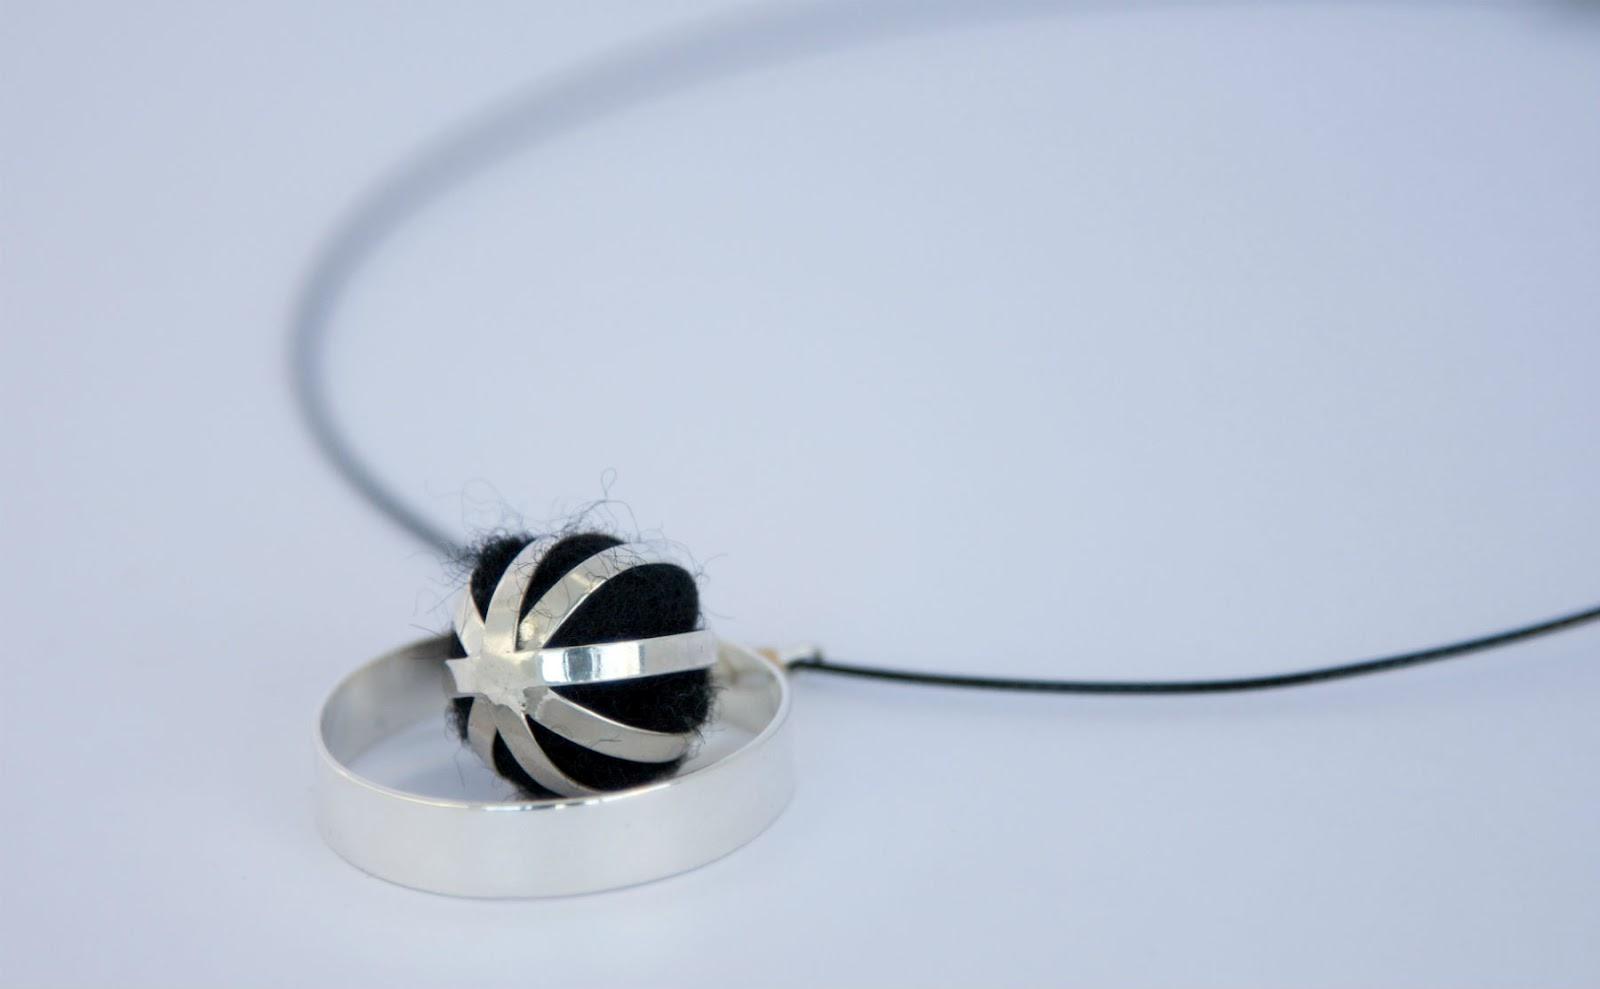 3c93a3fea5f9 Verónica Arana  joyas contemporáneas de simple frescura